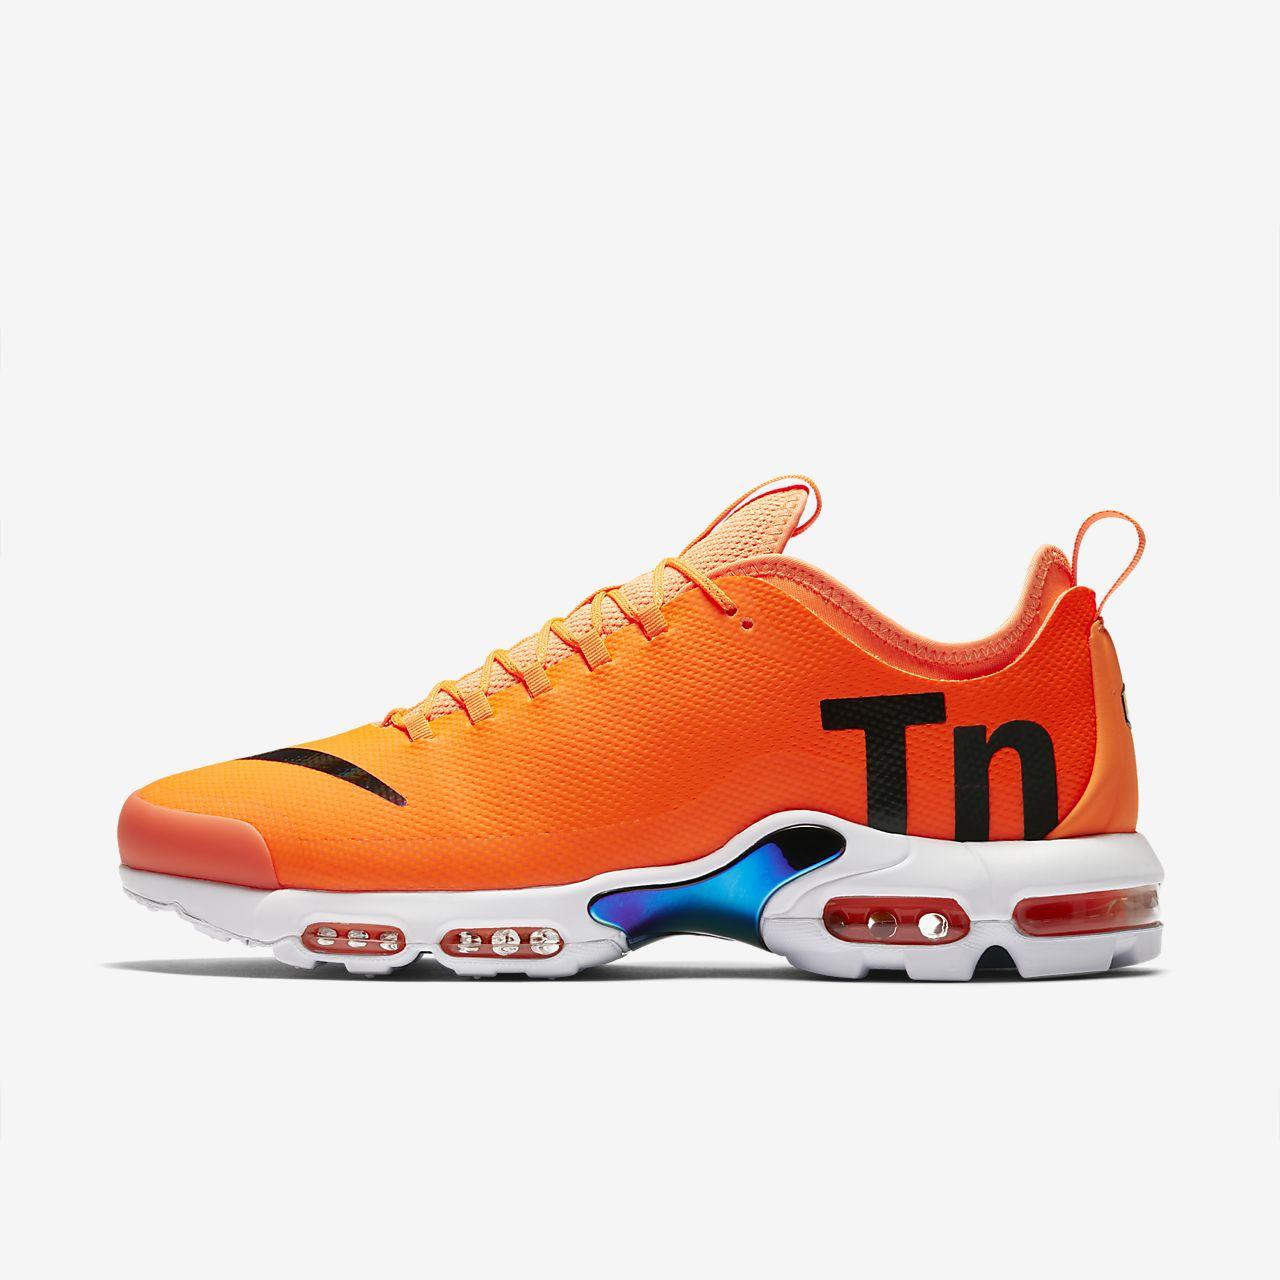 066126340cf Se Tn Plus Ultra Air Max Chaussure Homme Nike Pour Fr wYfnO